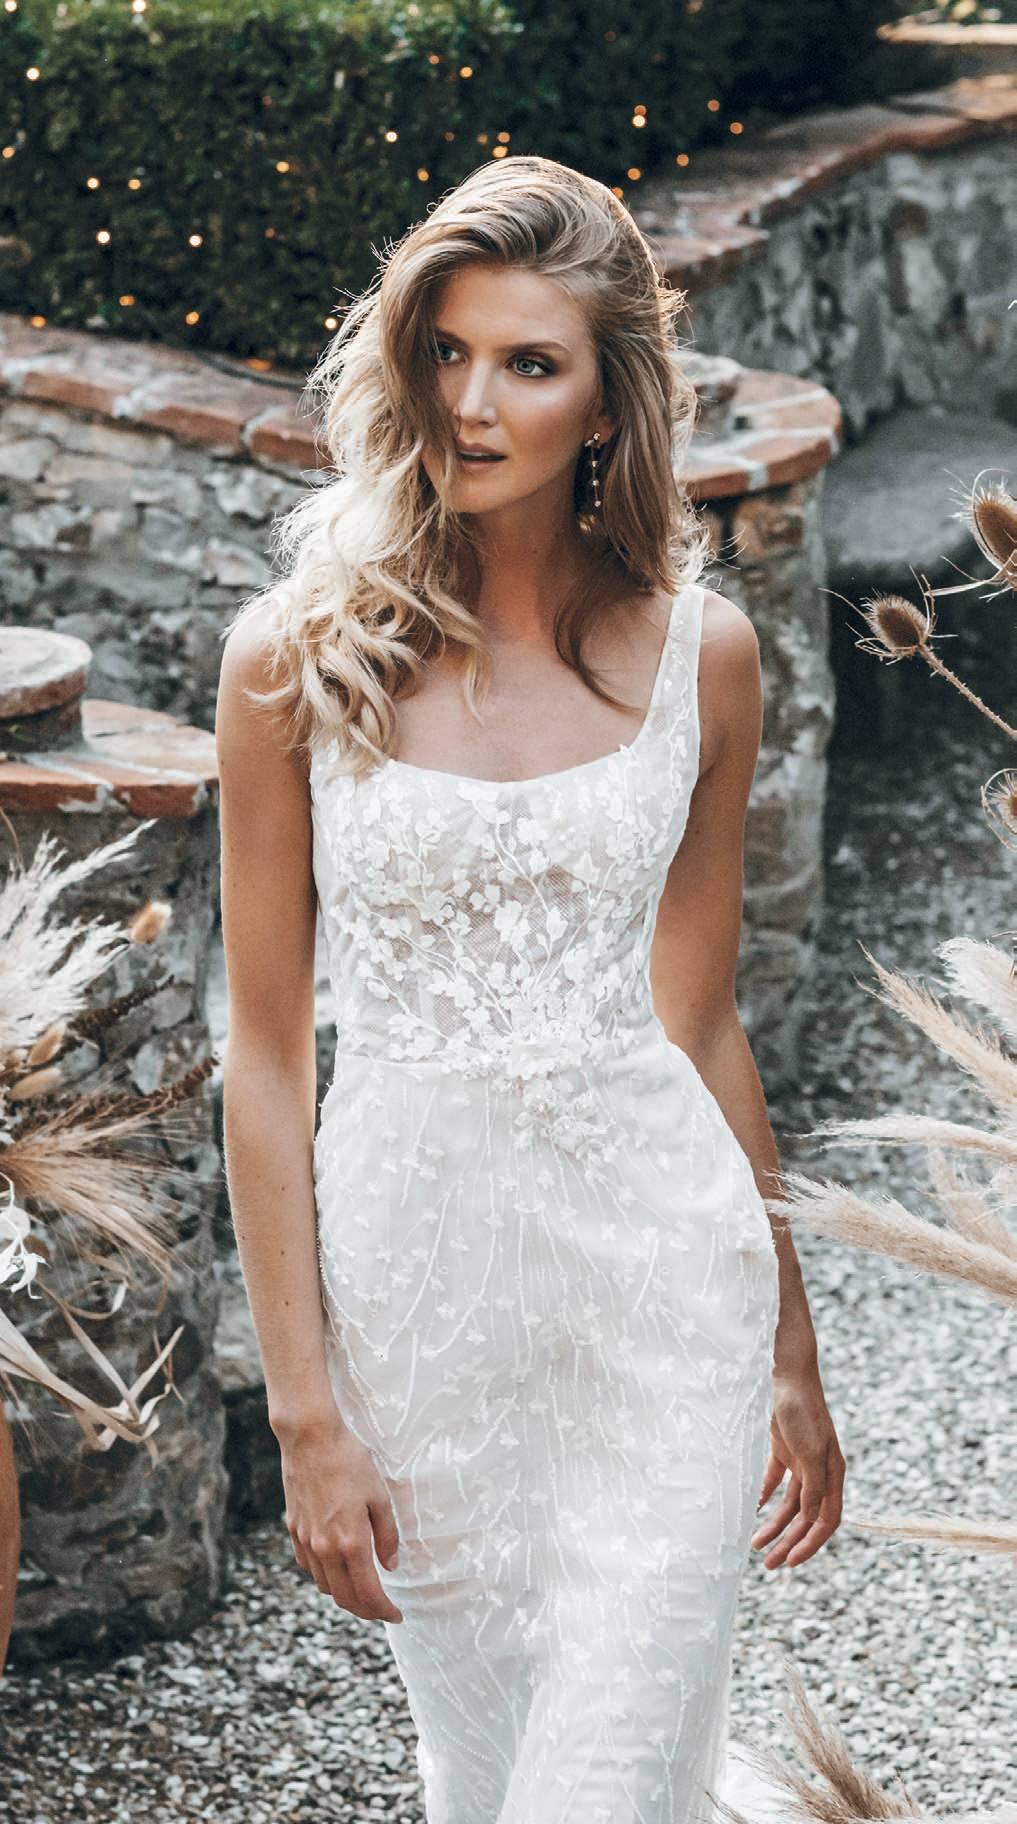 Abella-style-dress